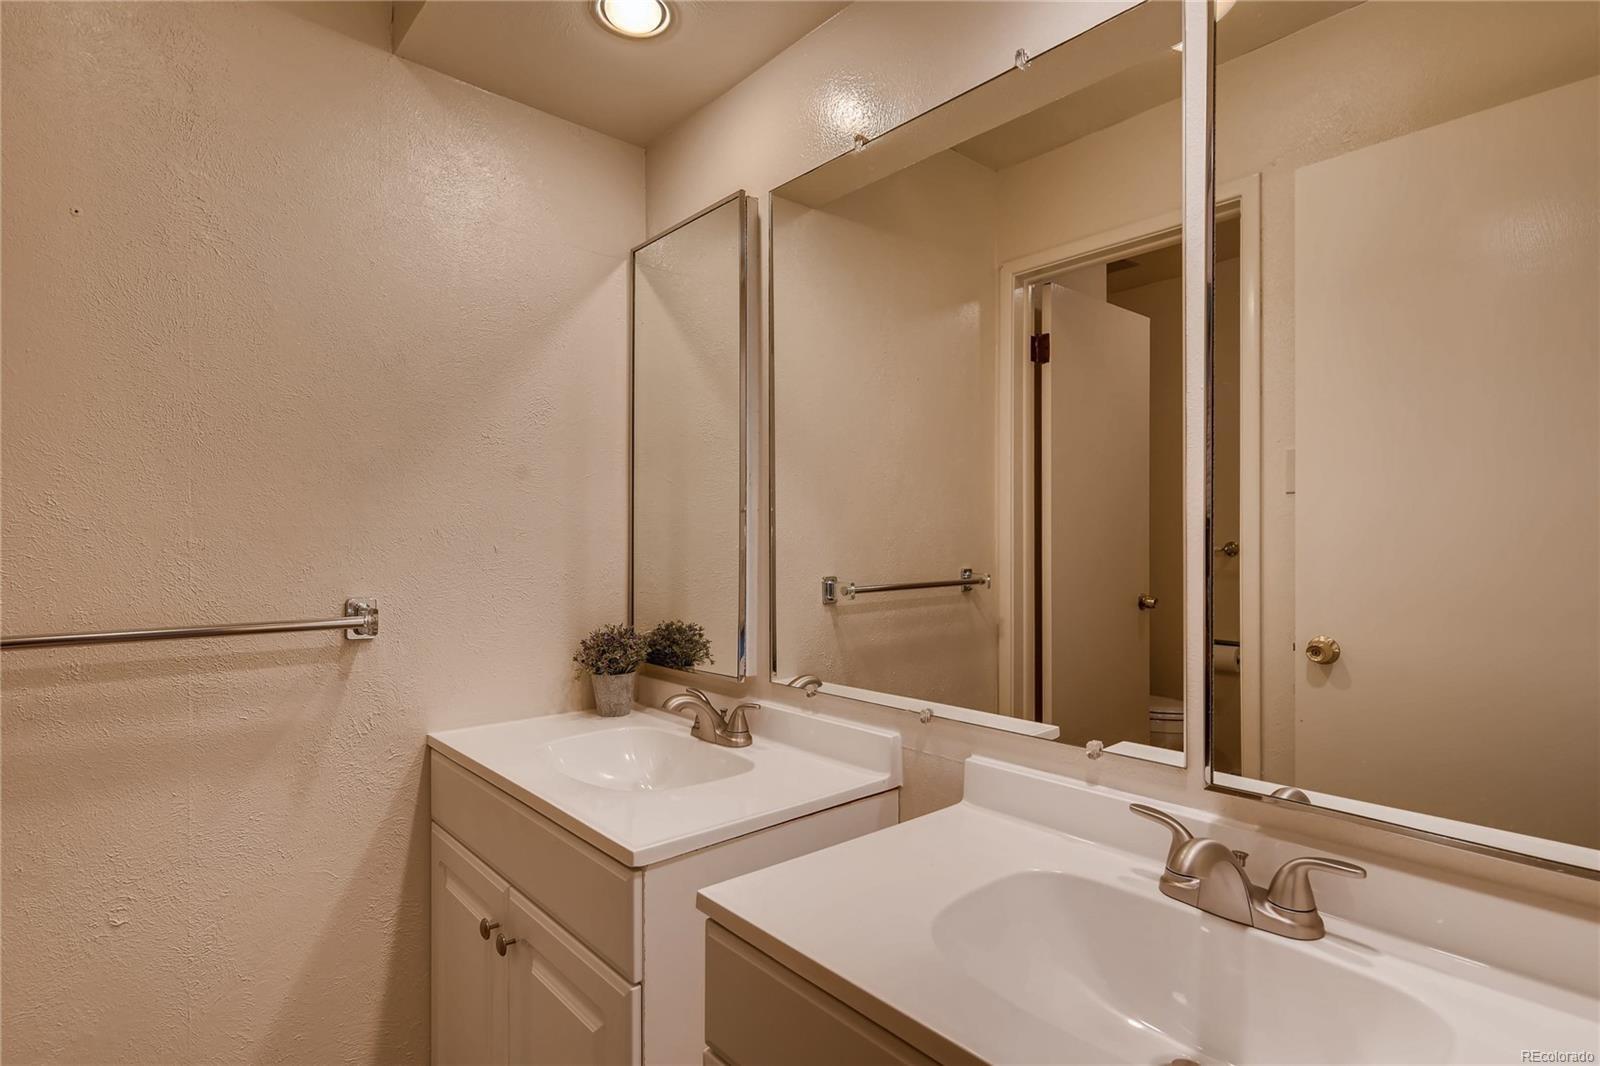 MLS# 7256084 - 1 - 13267  W Montana Place, Lakewood, CO 80228